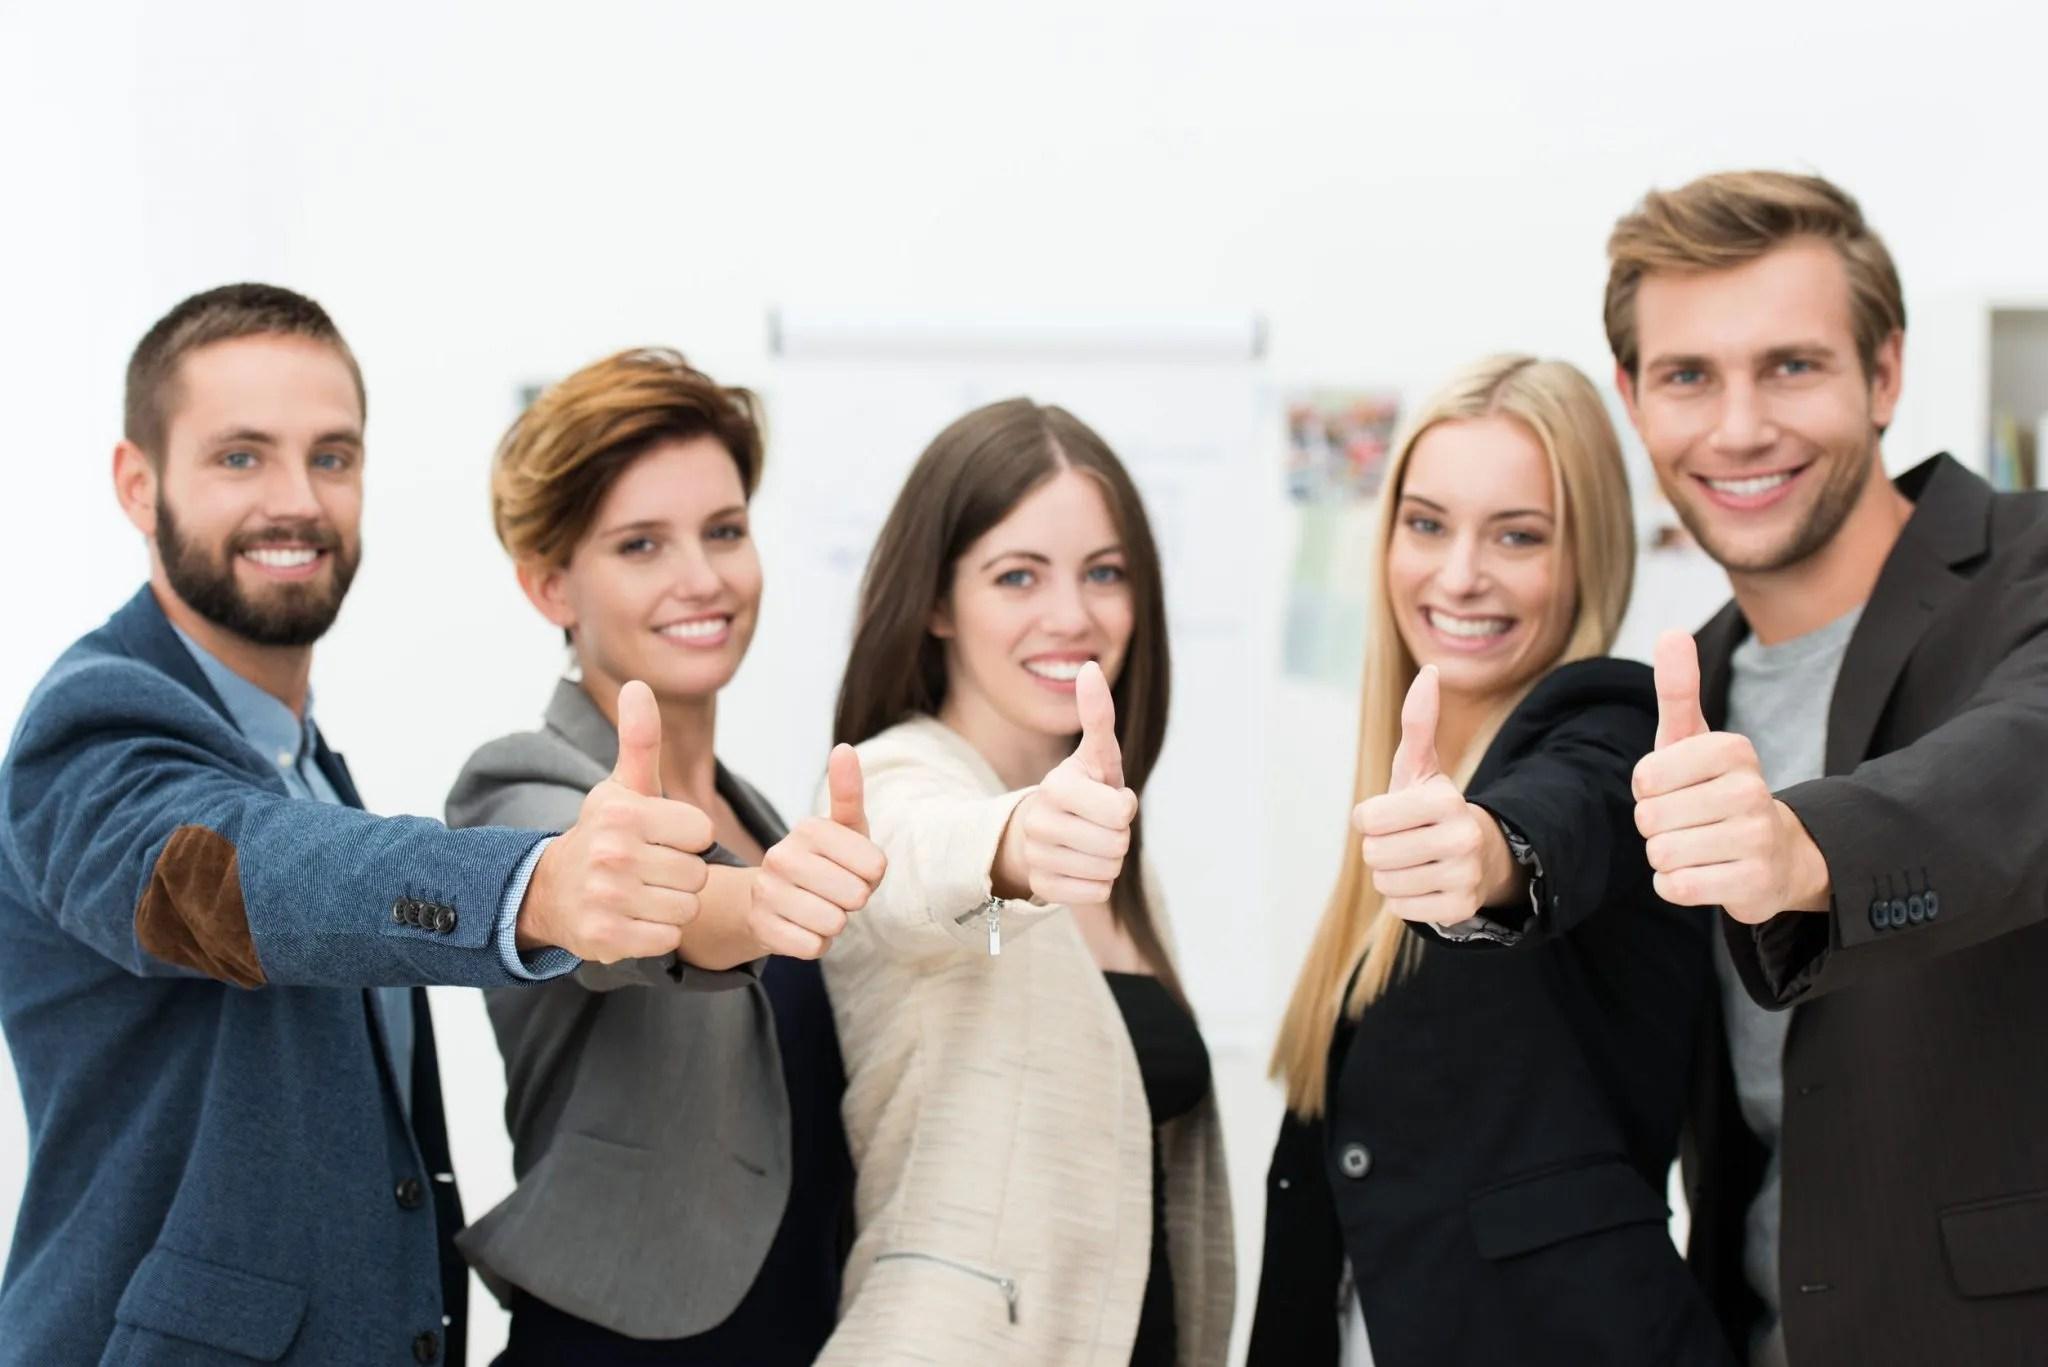 team building via trust